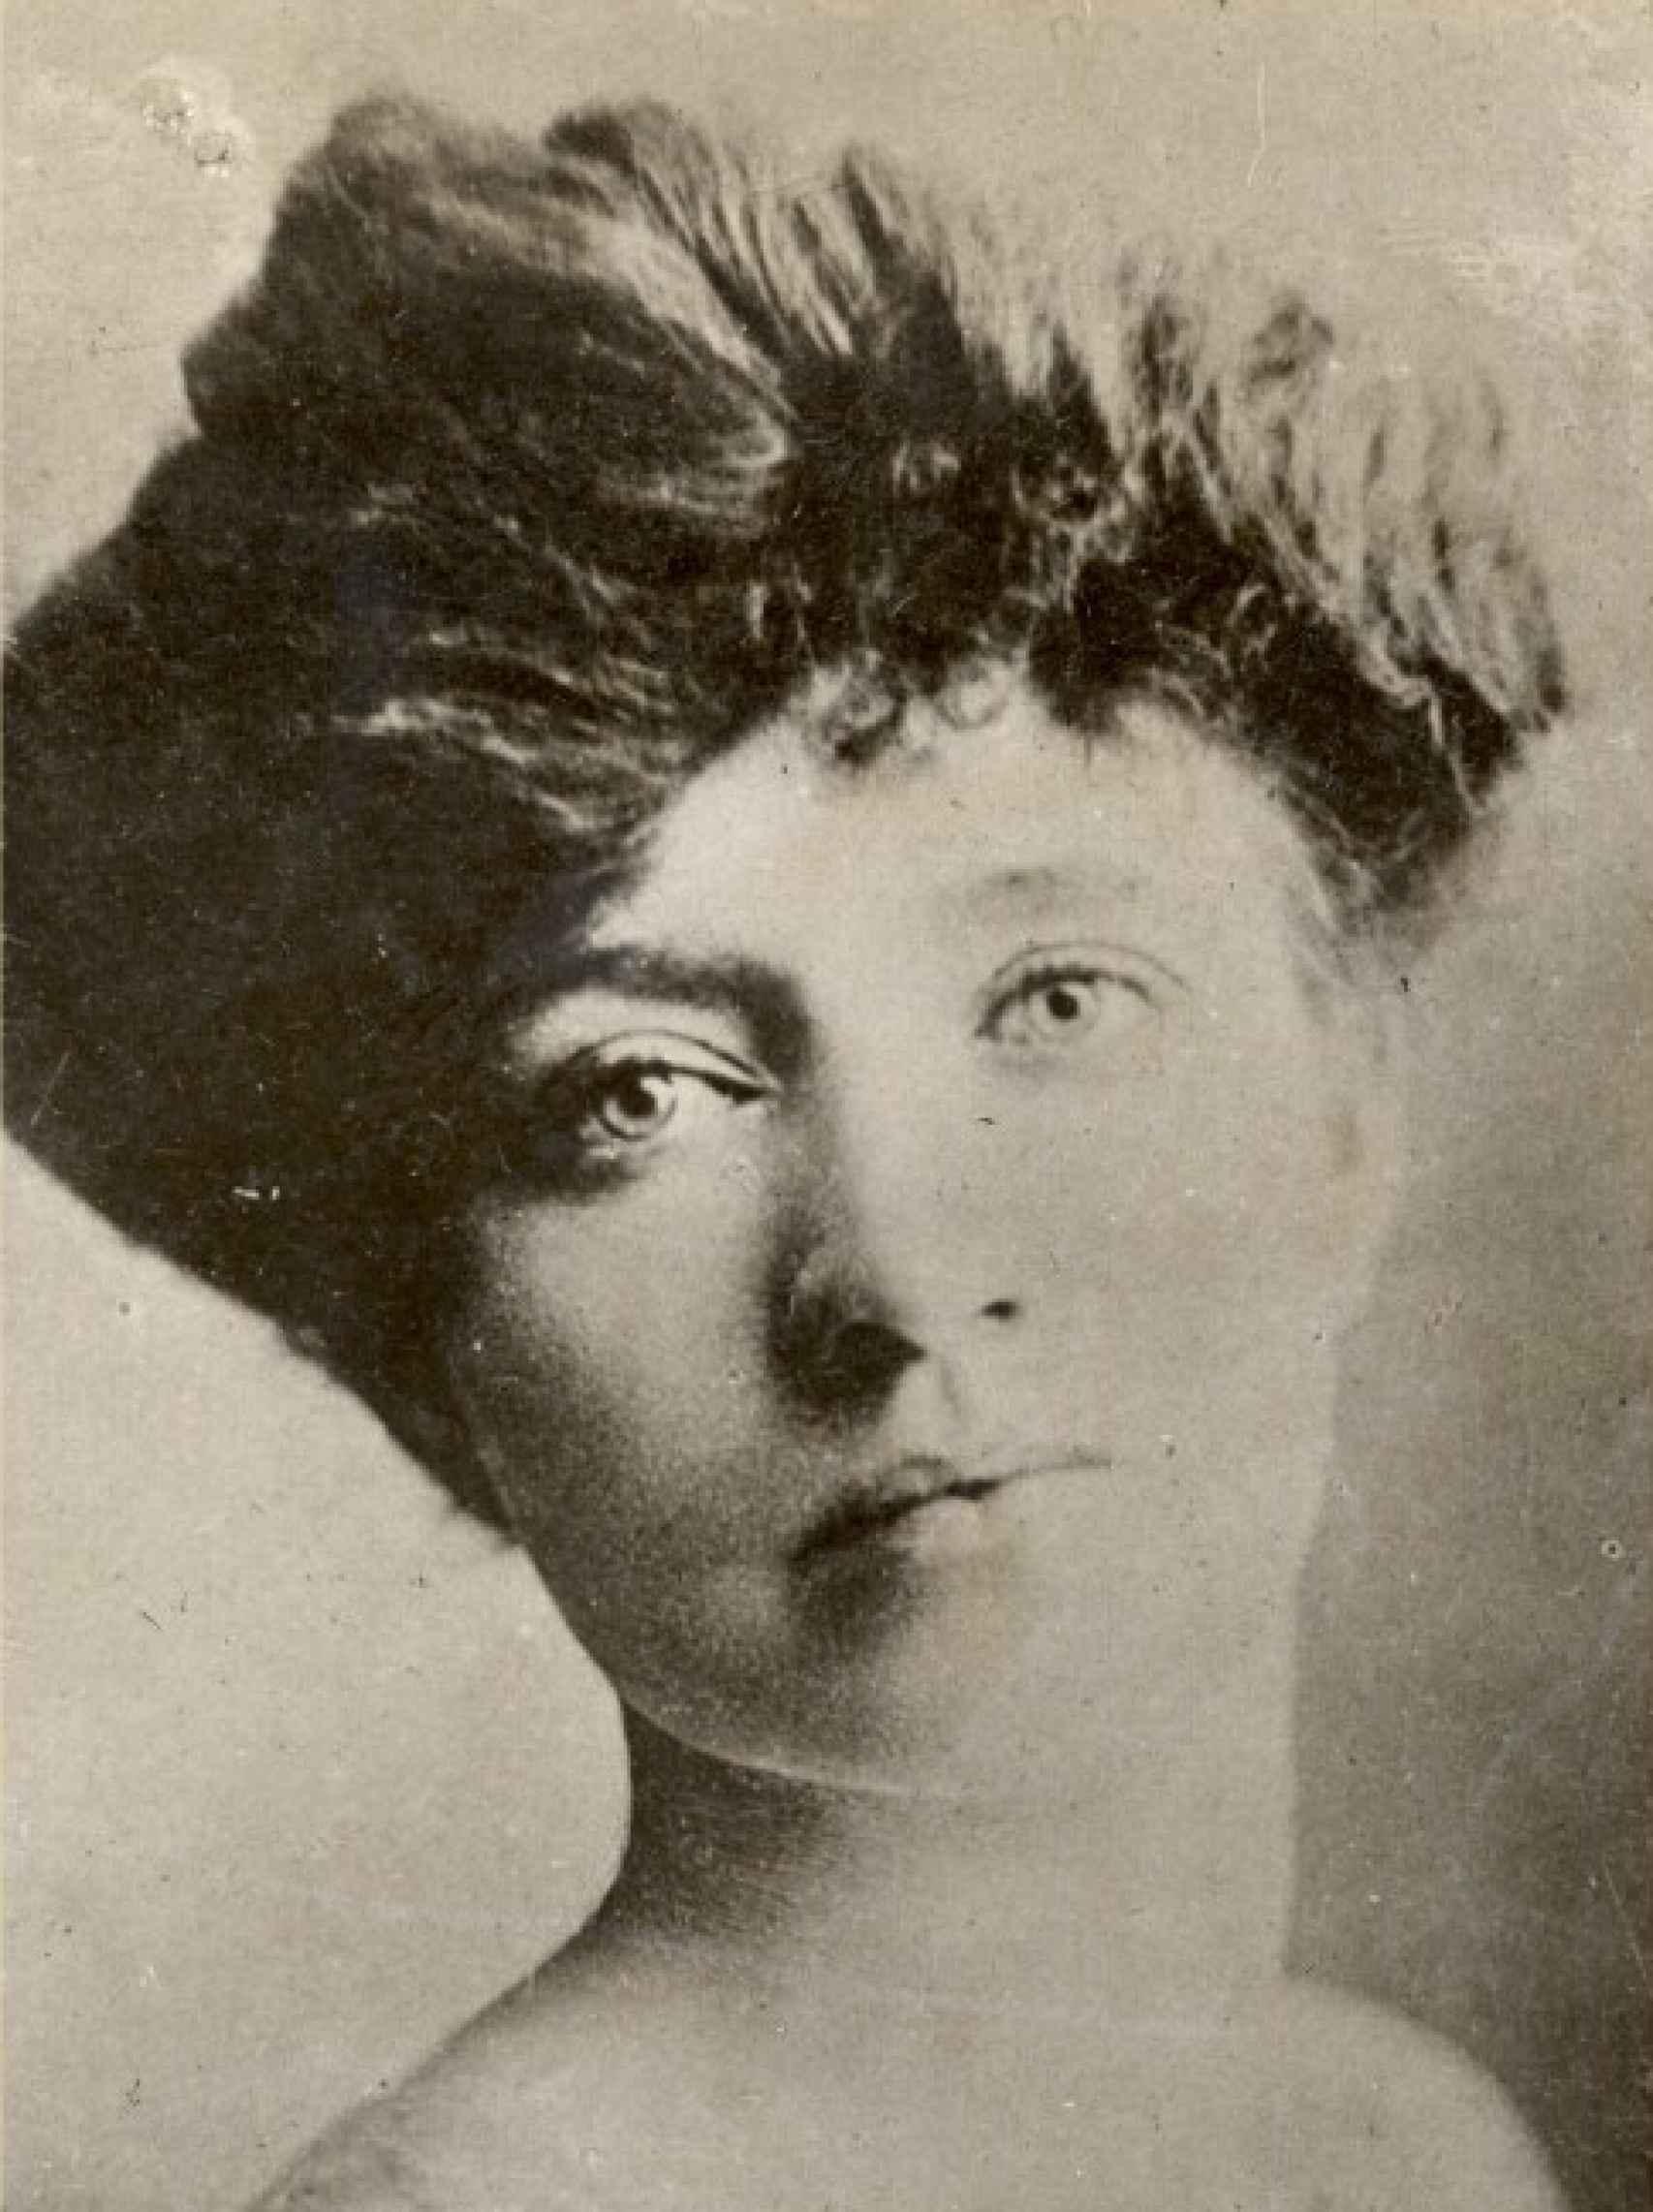 Kitty Marion en 1913.